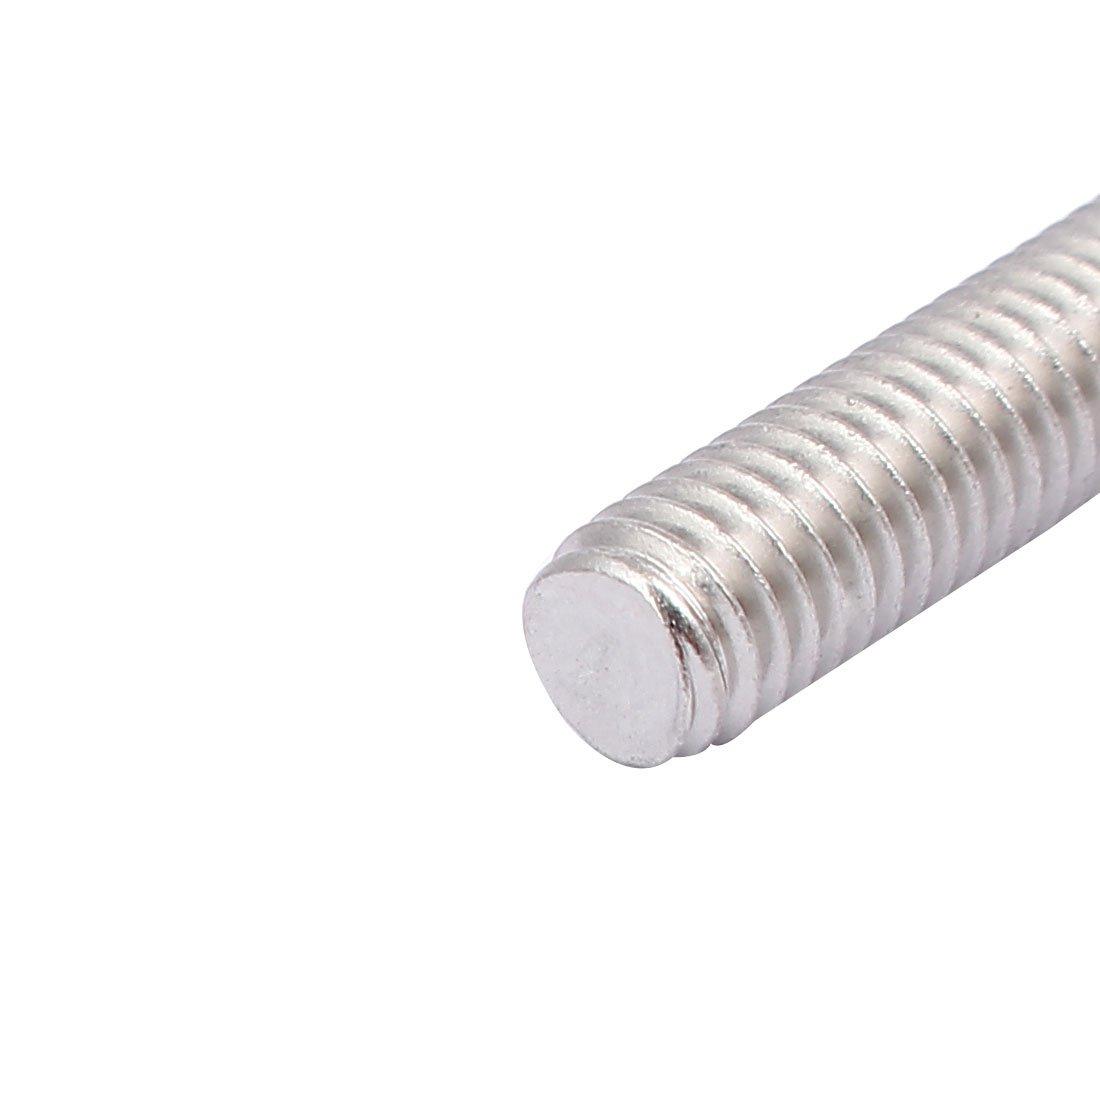 uxcell M5x70mm 304 Stainless Steel Button Head Hex Socket Cap Screws Bolts 10pcs a17022100ux0078